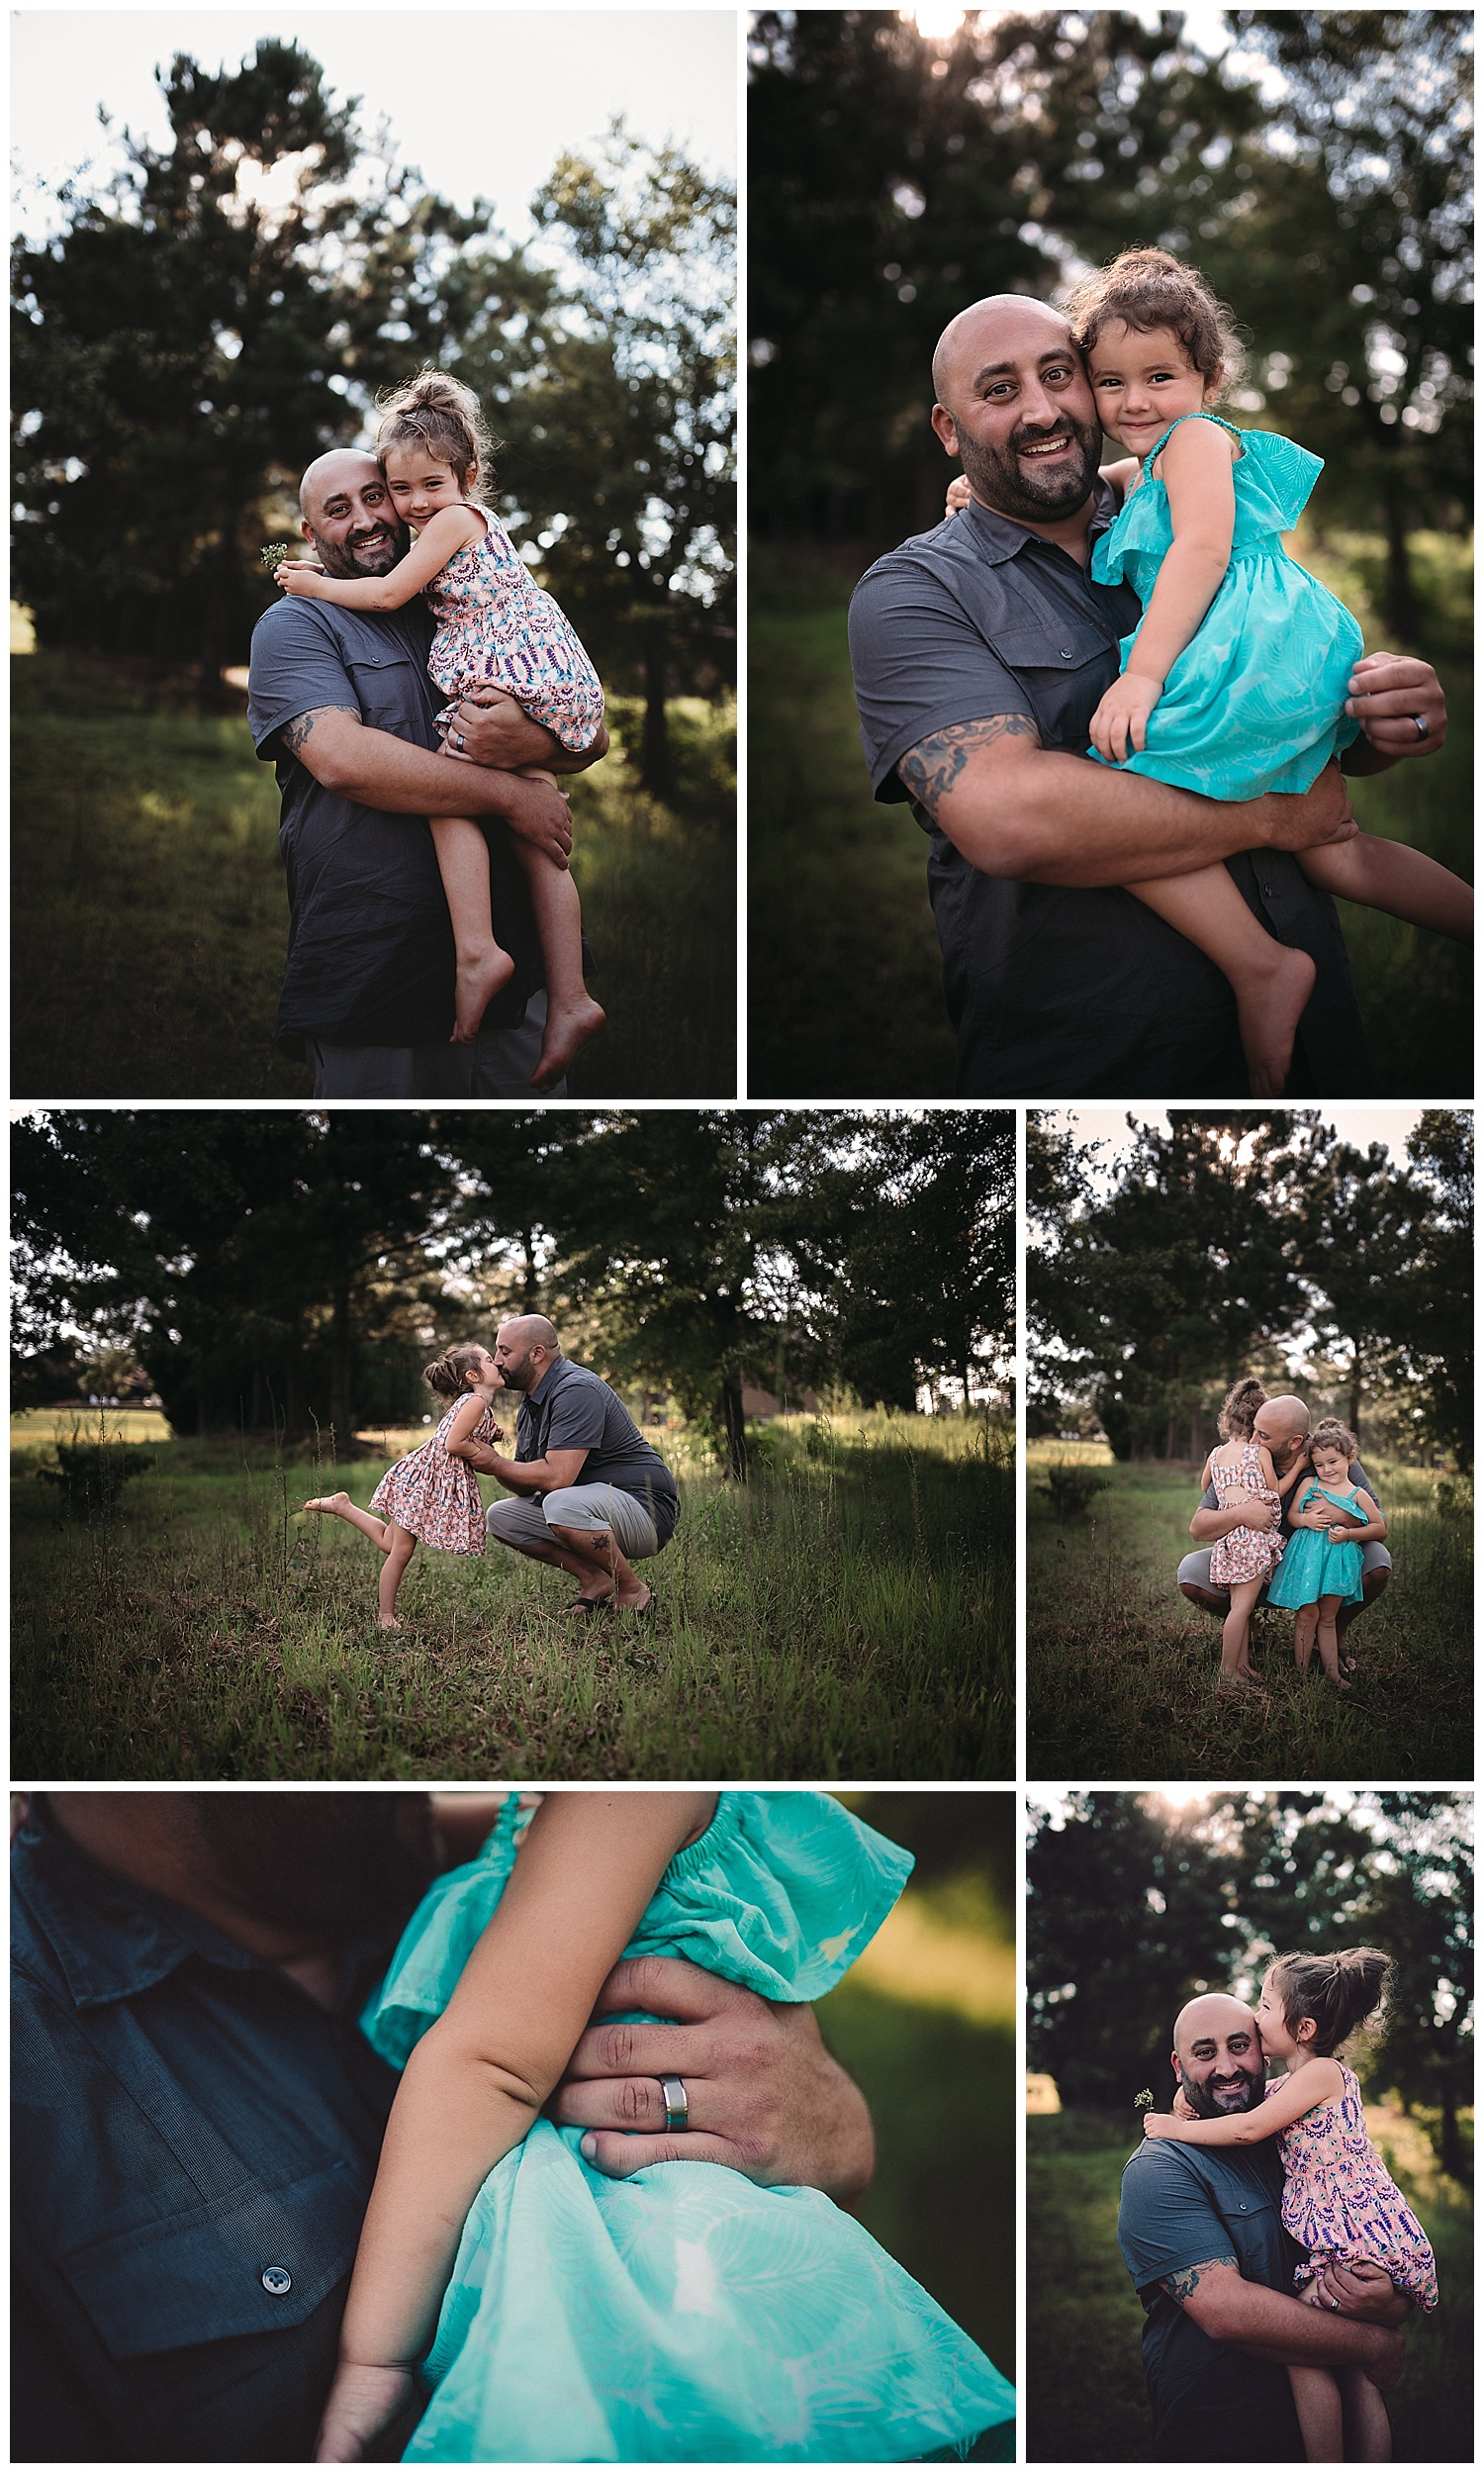 Destination Family Photographer in Atlanta GA from Wilkes Barre NEPA